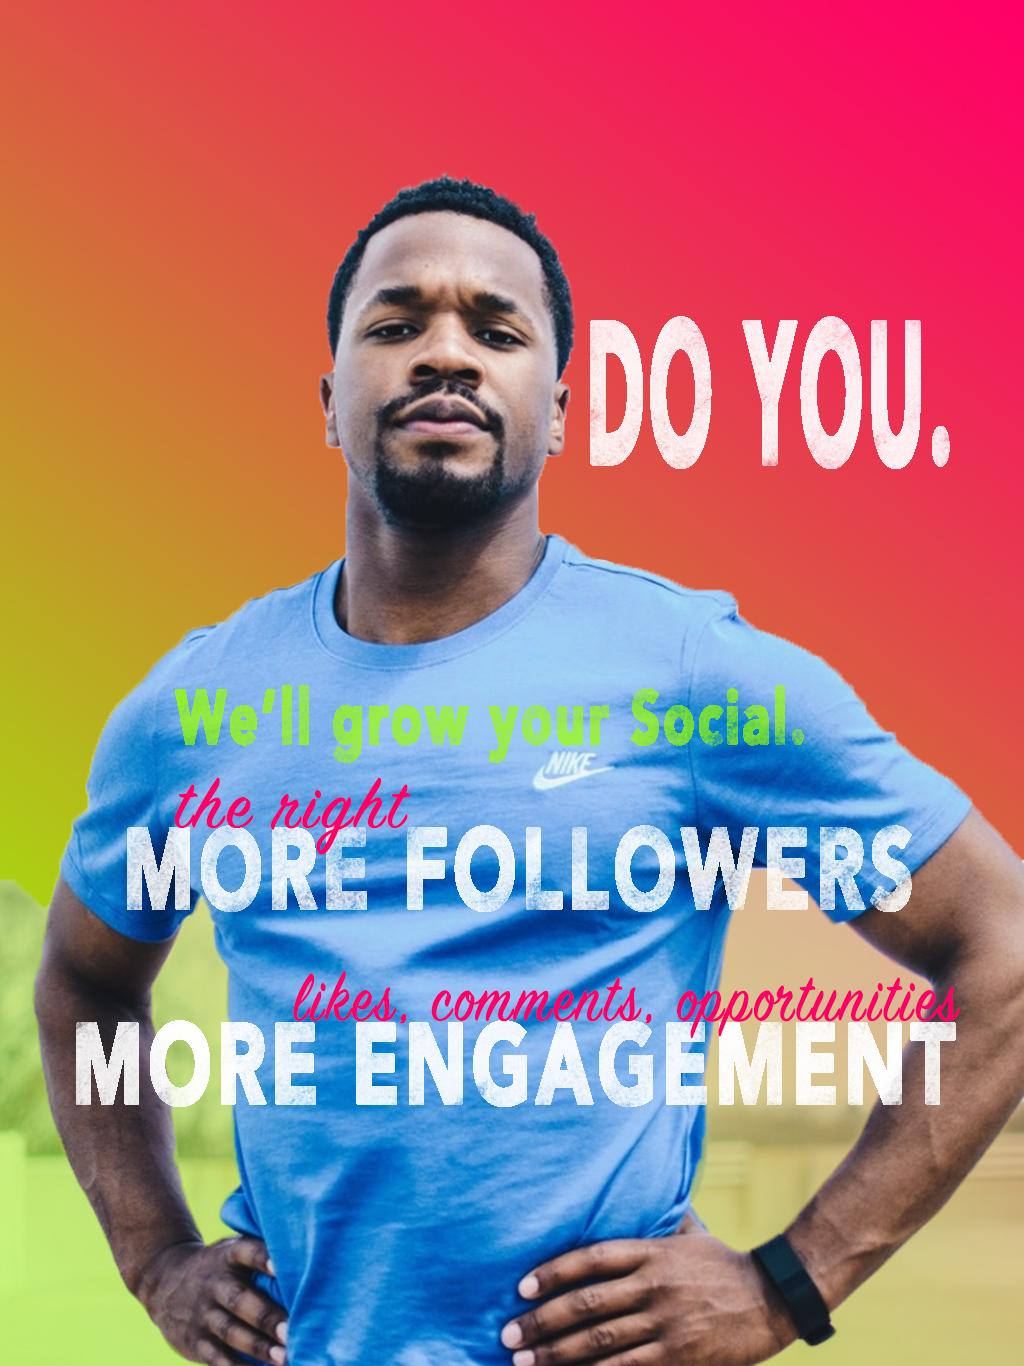 Instagram Social Growth - More Followers More Engagement.jpg